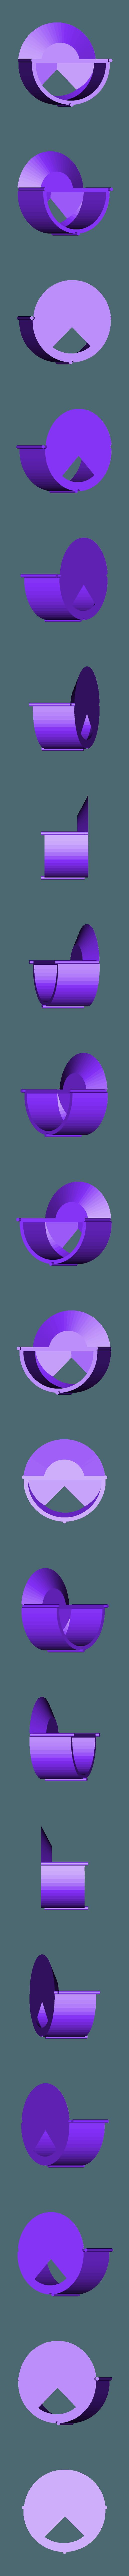 Dispenser Resevoir.stl Download free STL file Jelly Bean Dispenser • 3D printer template, Onyxia